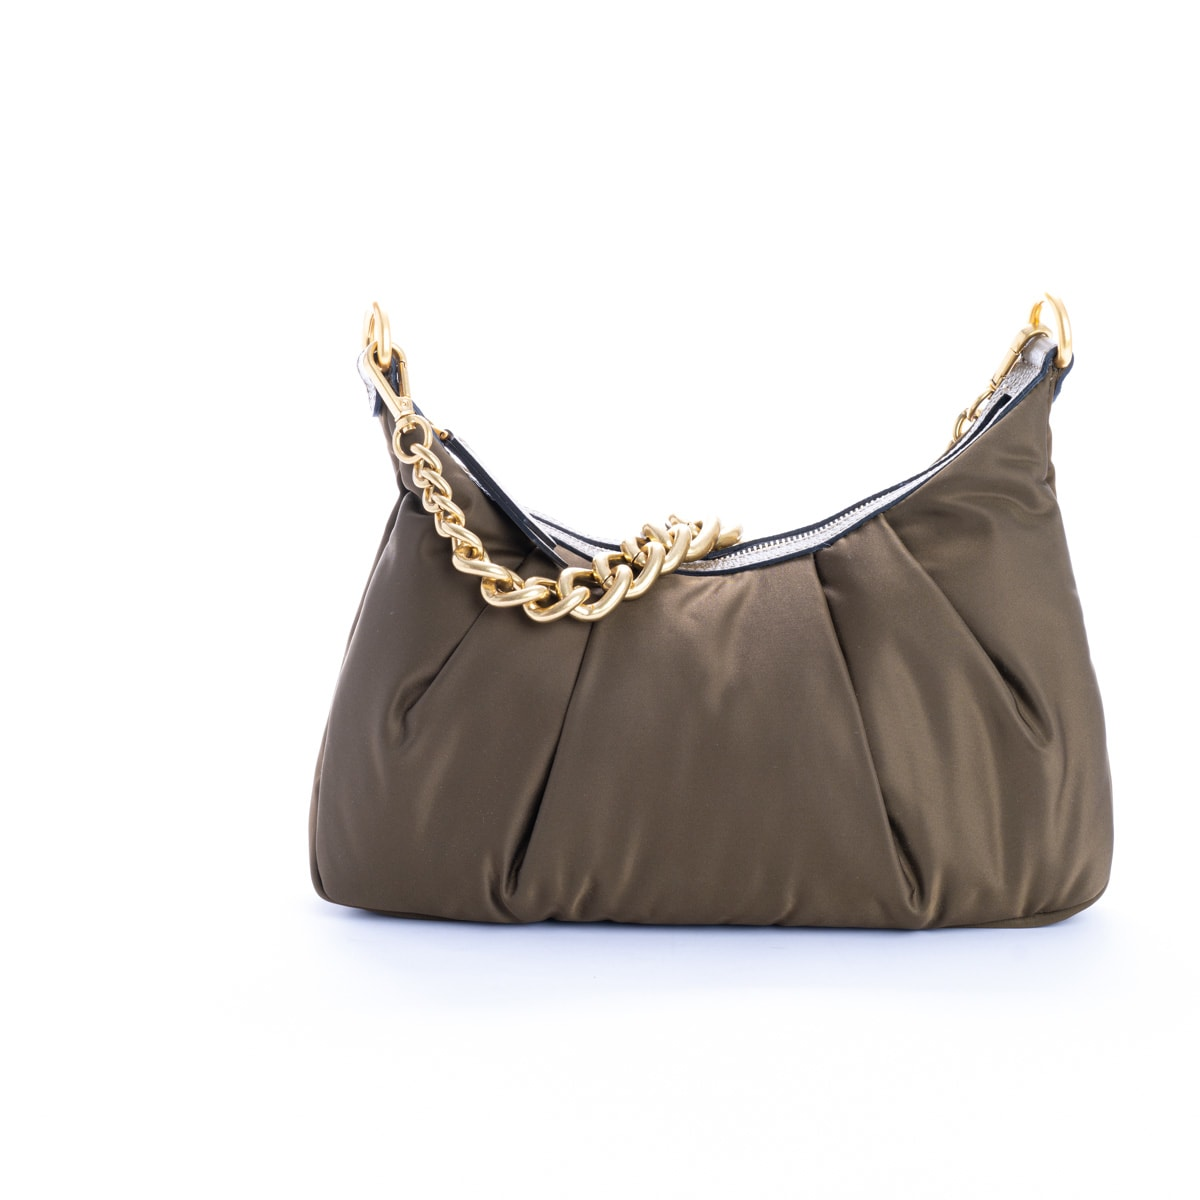 Gianni Chiarini Gianni Chiarini bonnie Shoulder Bag